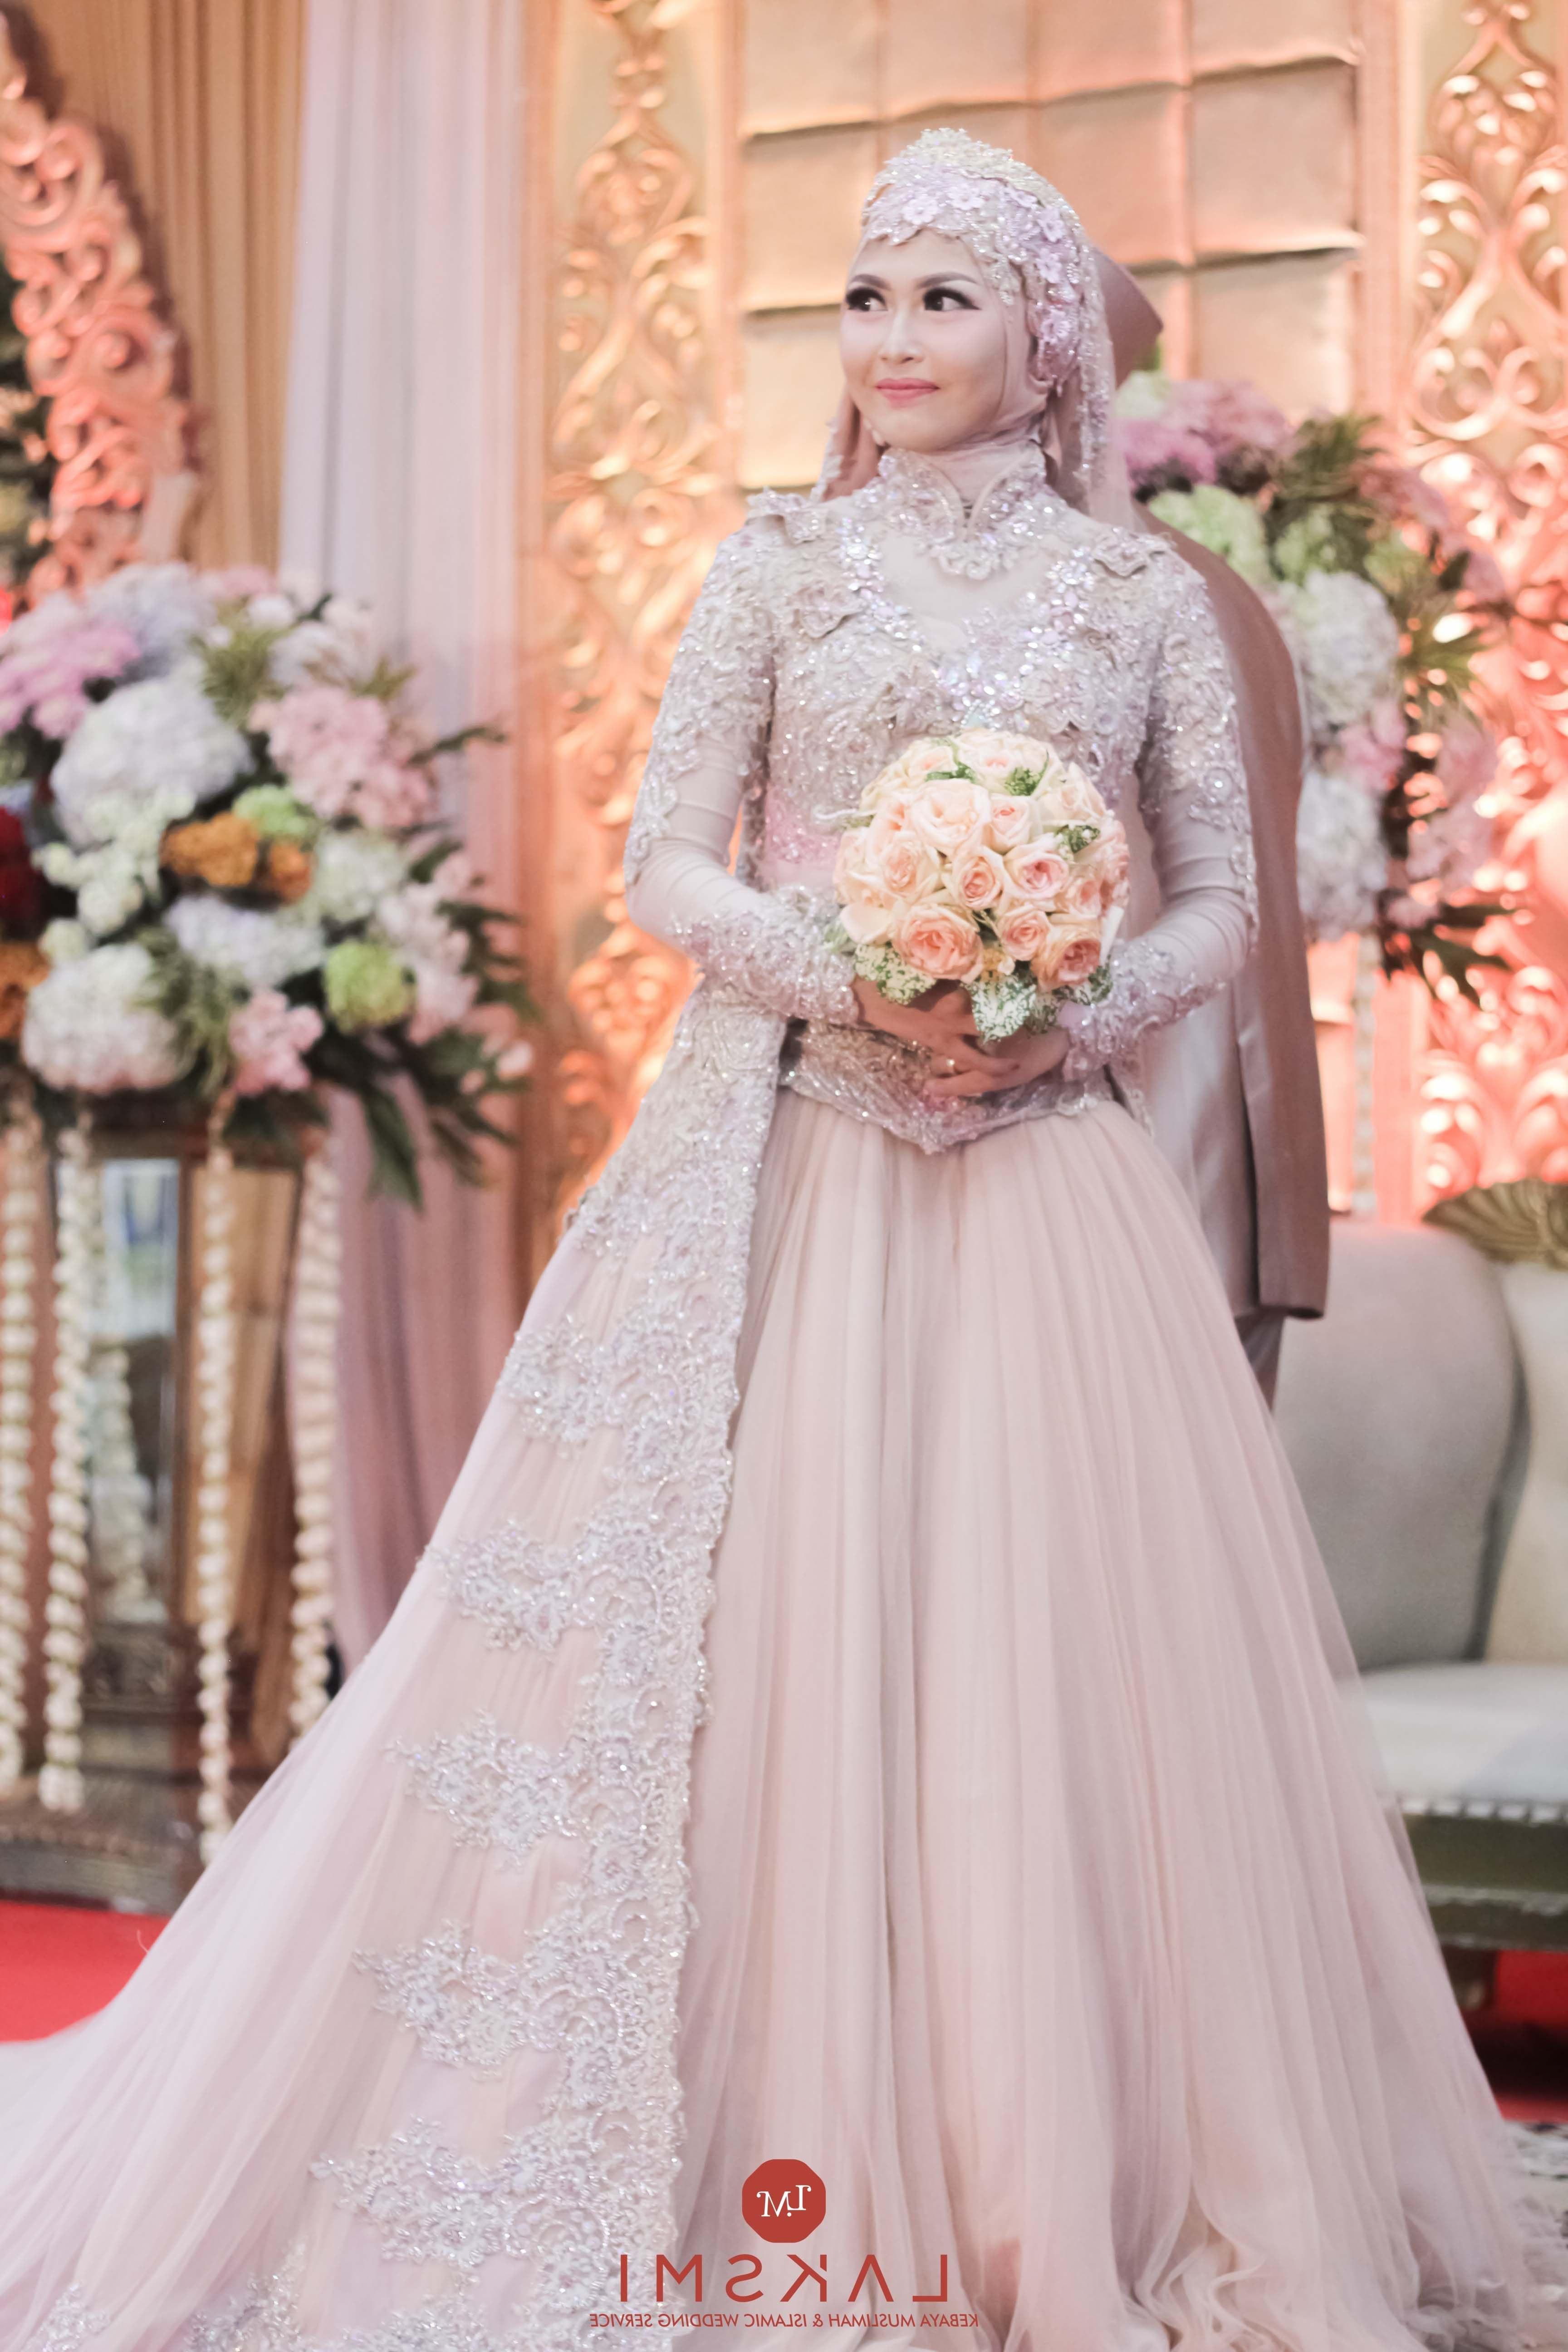 Model Baju Pengantin Muslimah Dian Pelangi Xtd6 the Bride In Kebaya Wedding Dress Wedding Shot List Bride